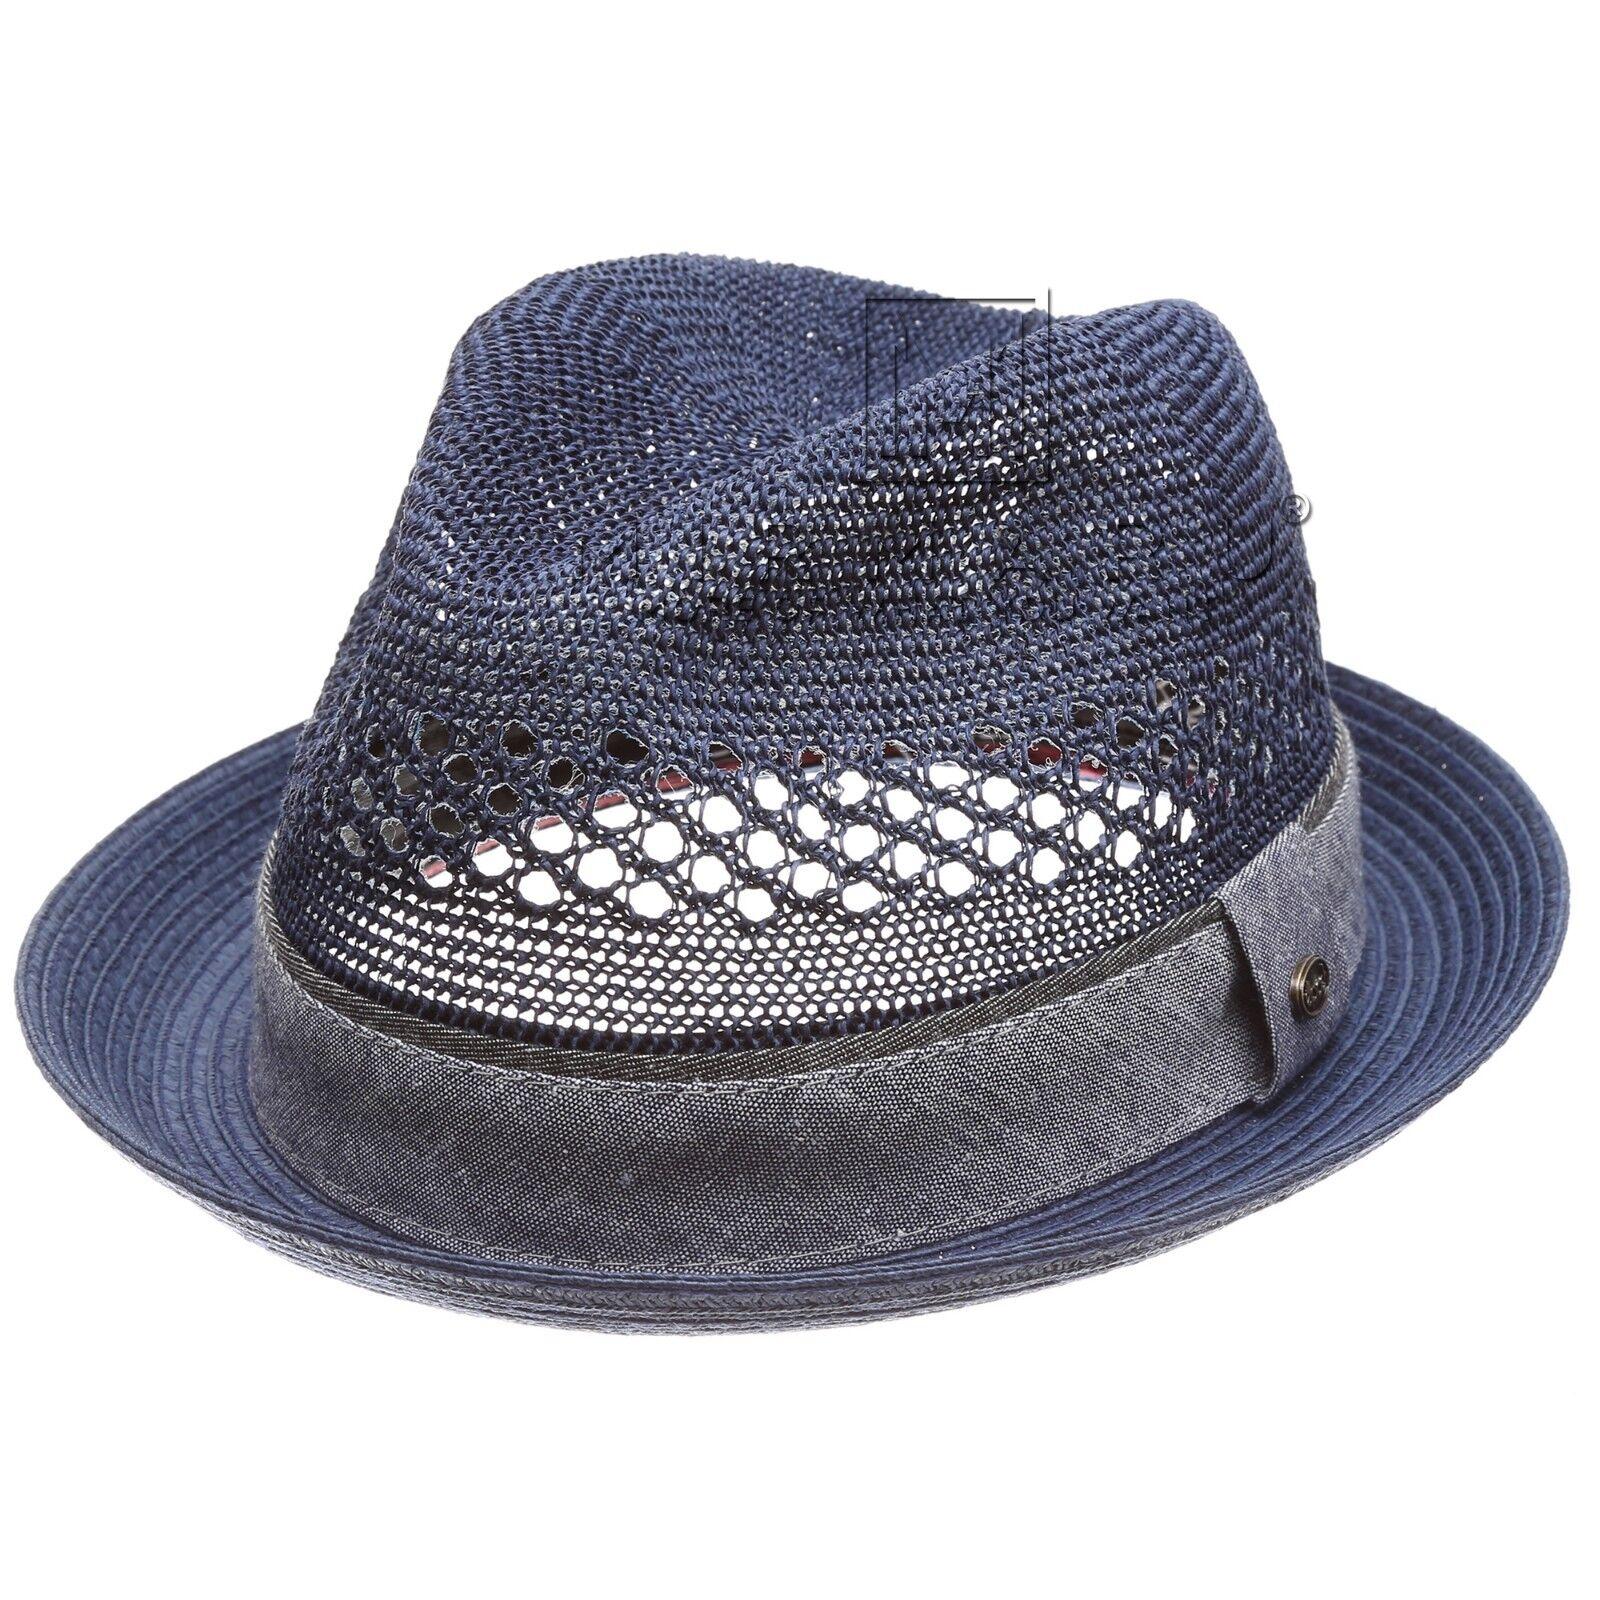 Men's Summer Trilby Straw Vented Mesh Crown Crushable Trilby Summer Short Brim Fedora Hat Cap 3e438d